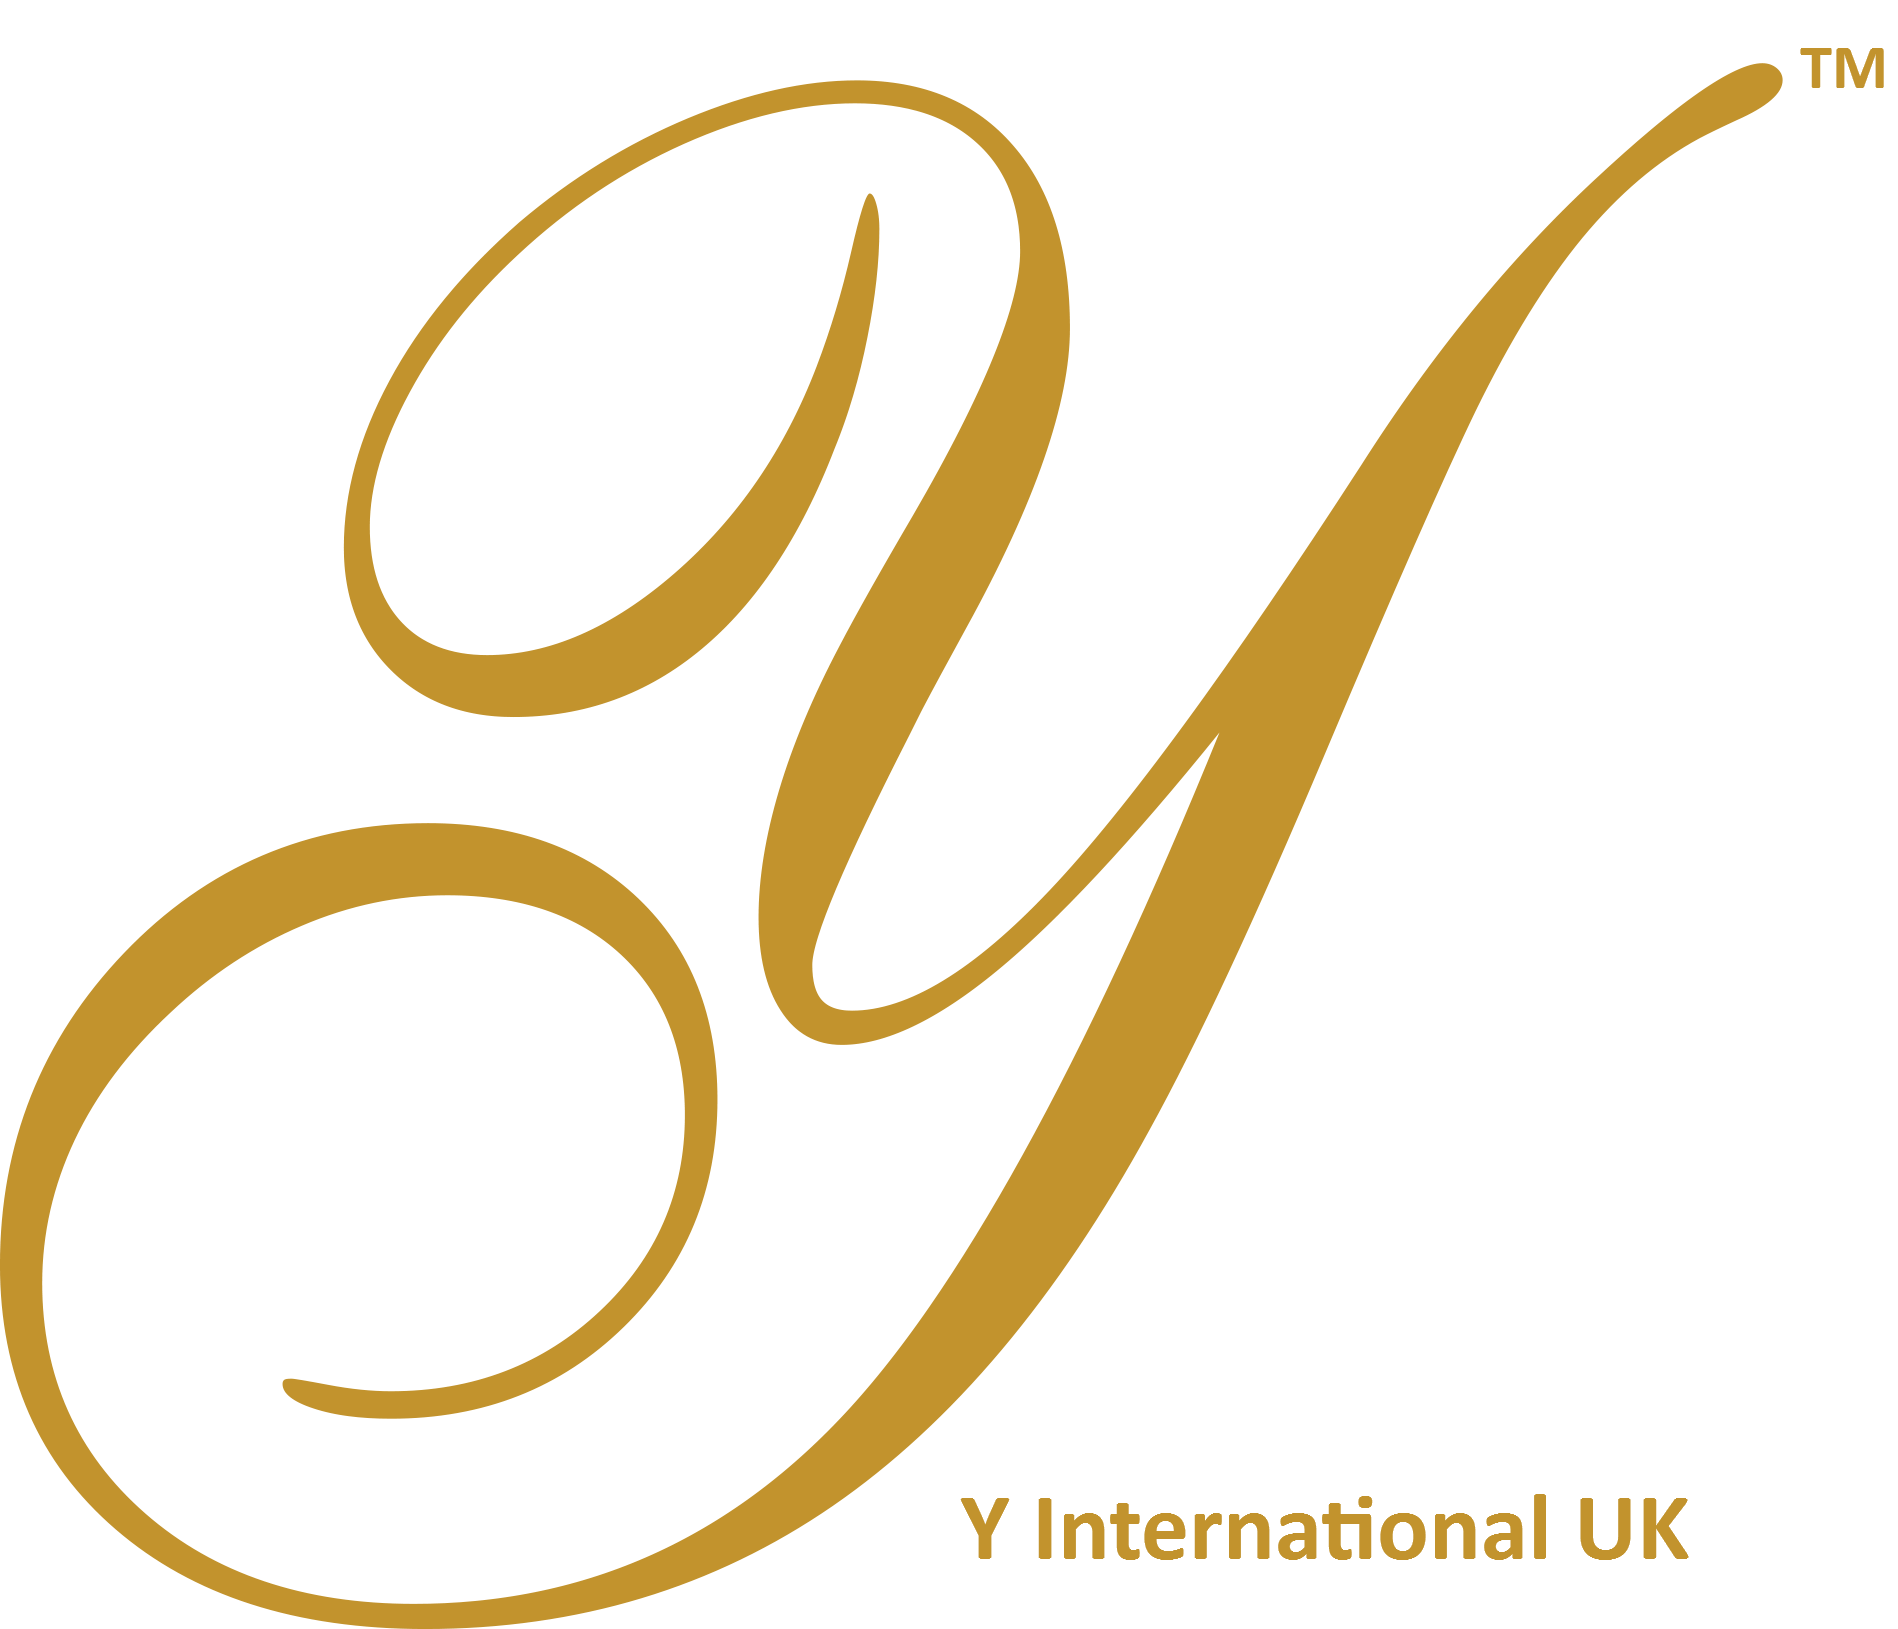 Y International Uk